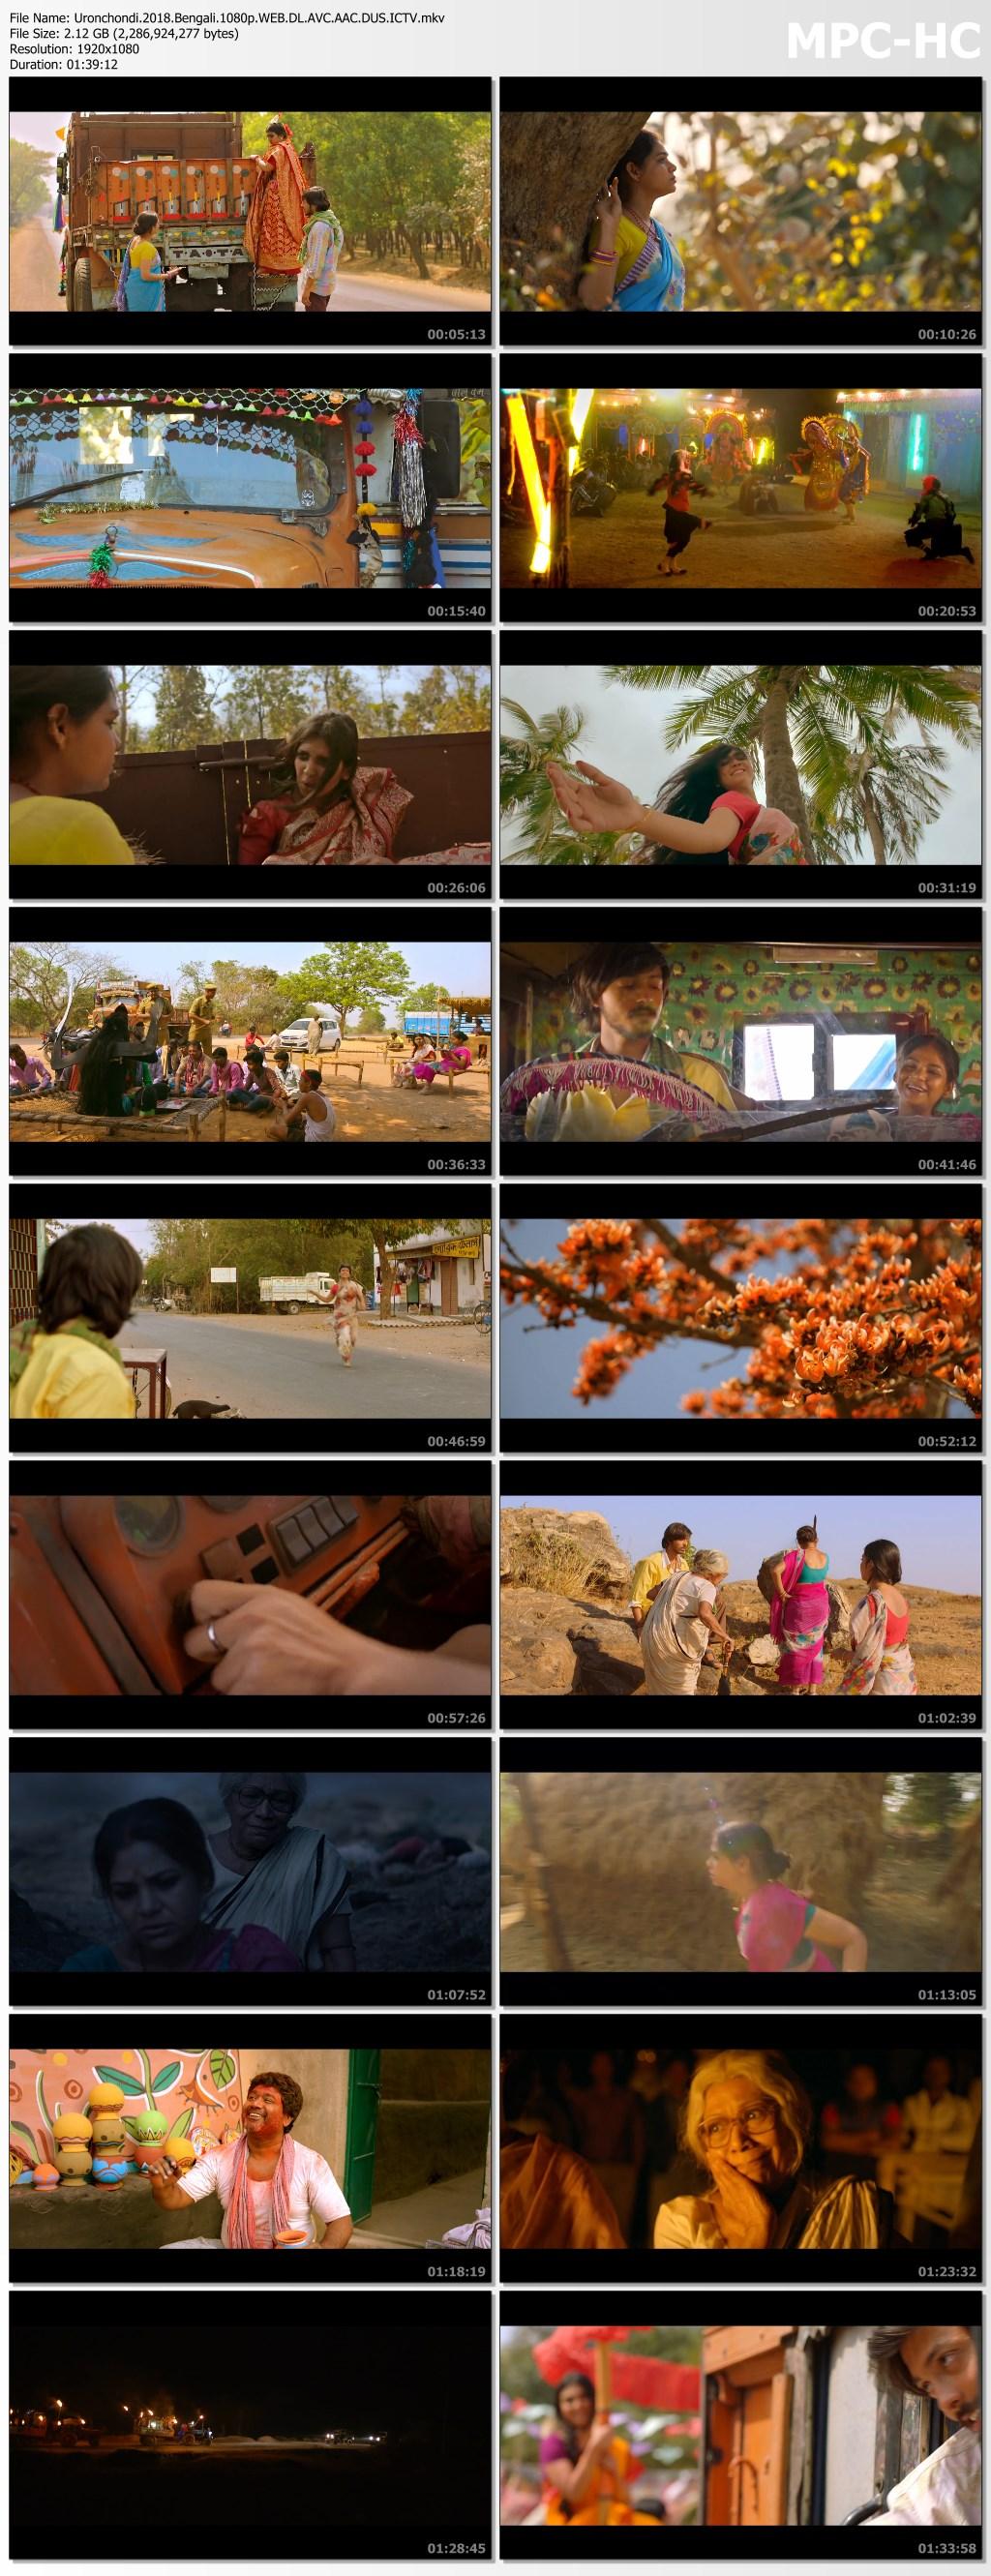 Uronchondi.2018.Bengali.1080p.WEB.DL.AVC.AAC.DUS.ICTV.mkv thumbs